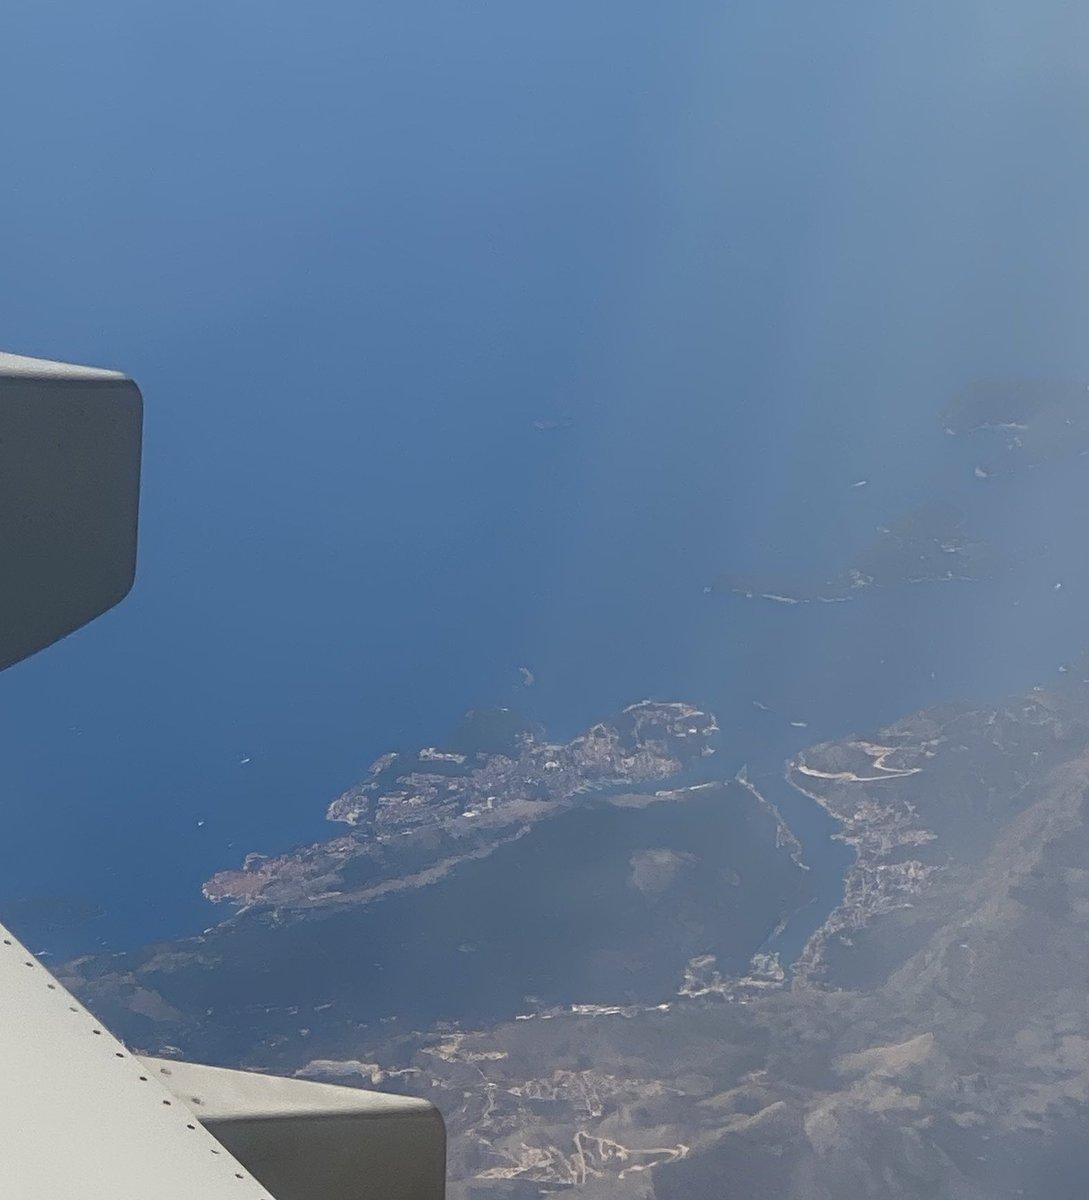 Dubrovnik 🇭🇷, Ulqin 🇲🇪 & Kepi i Radonit 🇦🇱 from the beautiful sunny Sunday sky. #AdriaticSea https://t.co/FL1qpxs2ZS